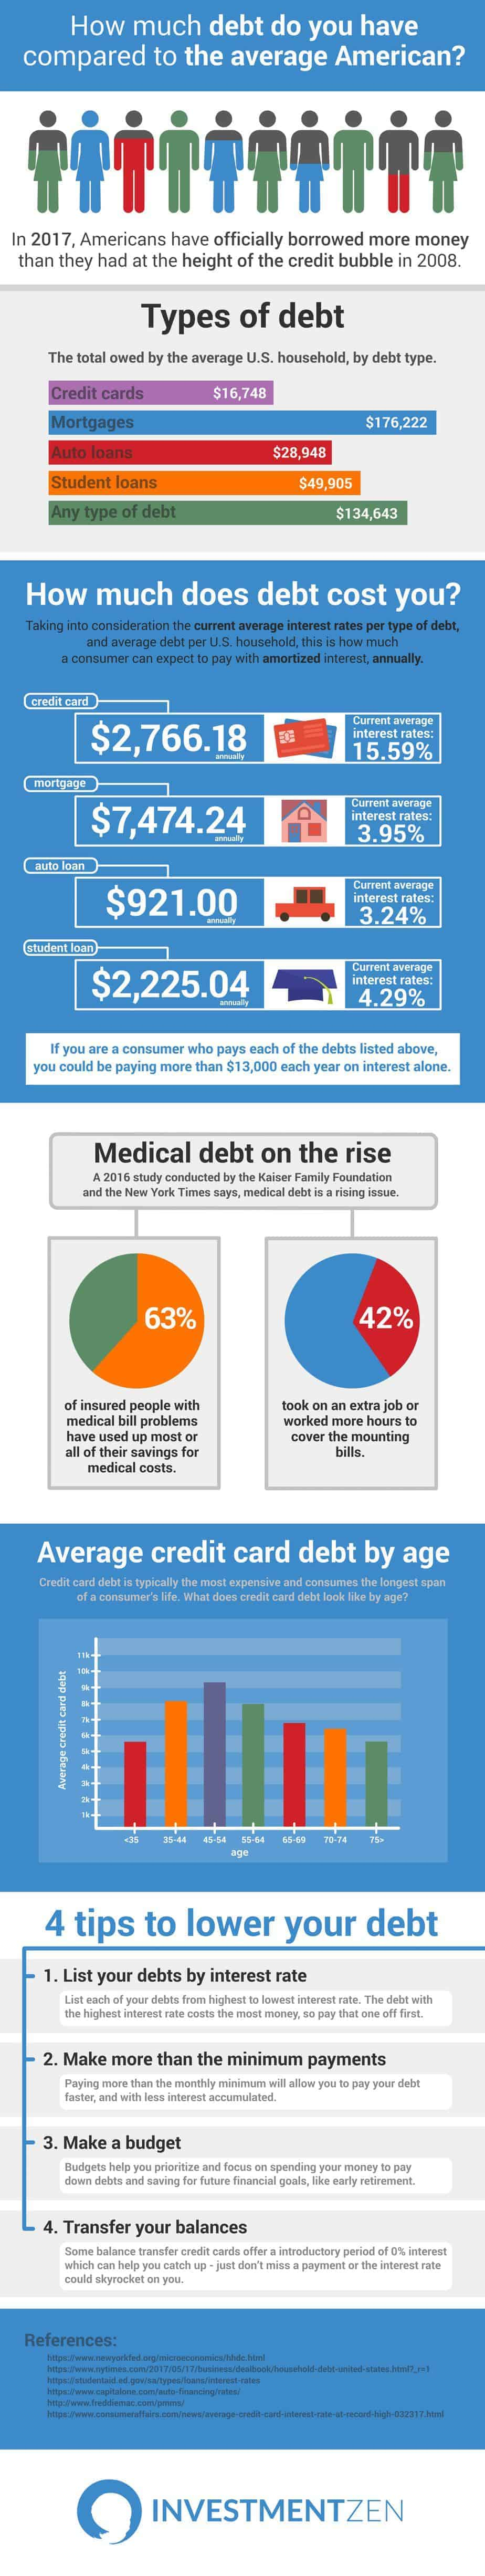 Average Household Debt In America Infographic